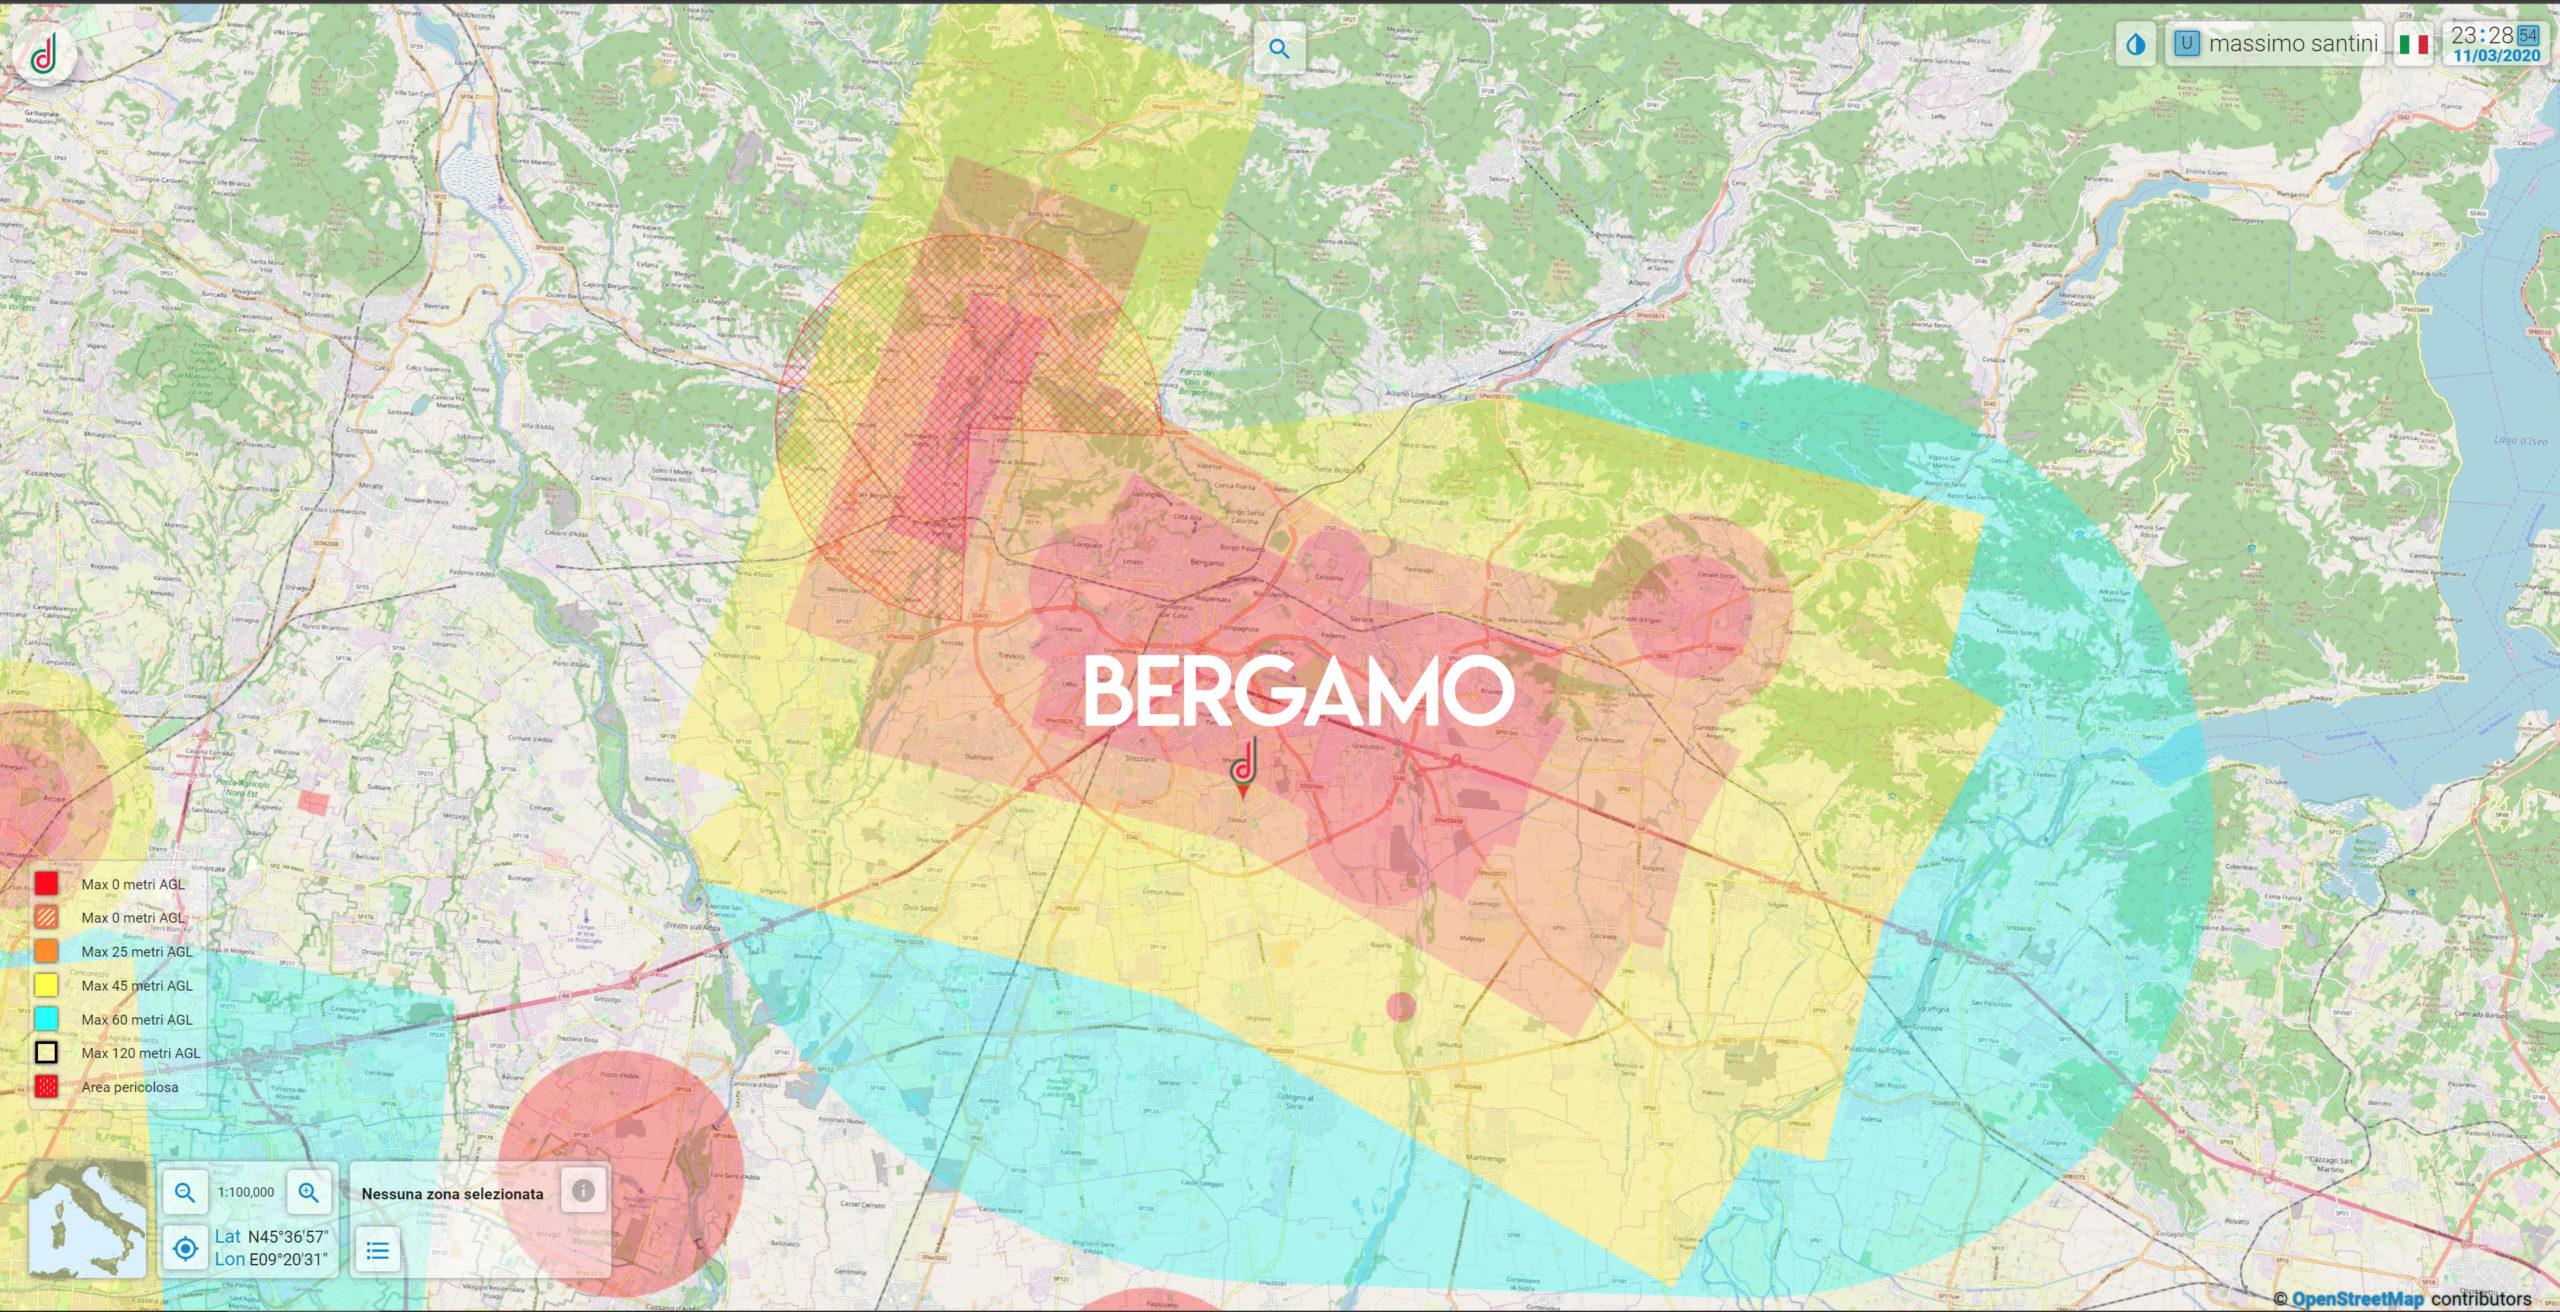 Mappa Aeronautica Bergamo